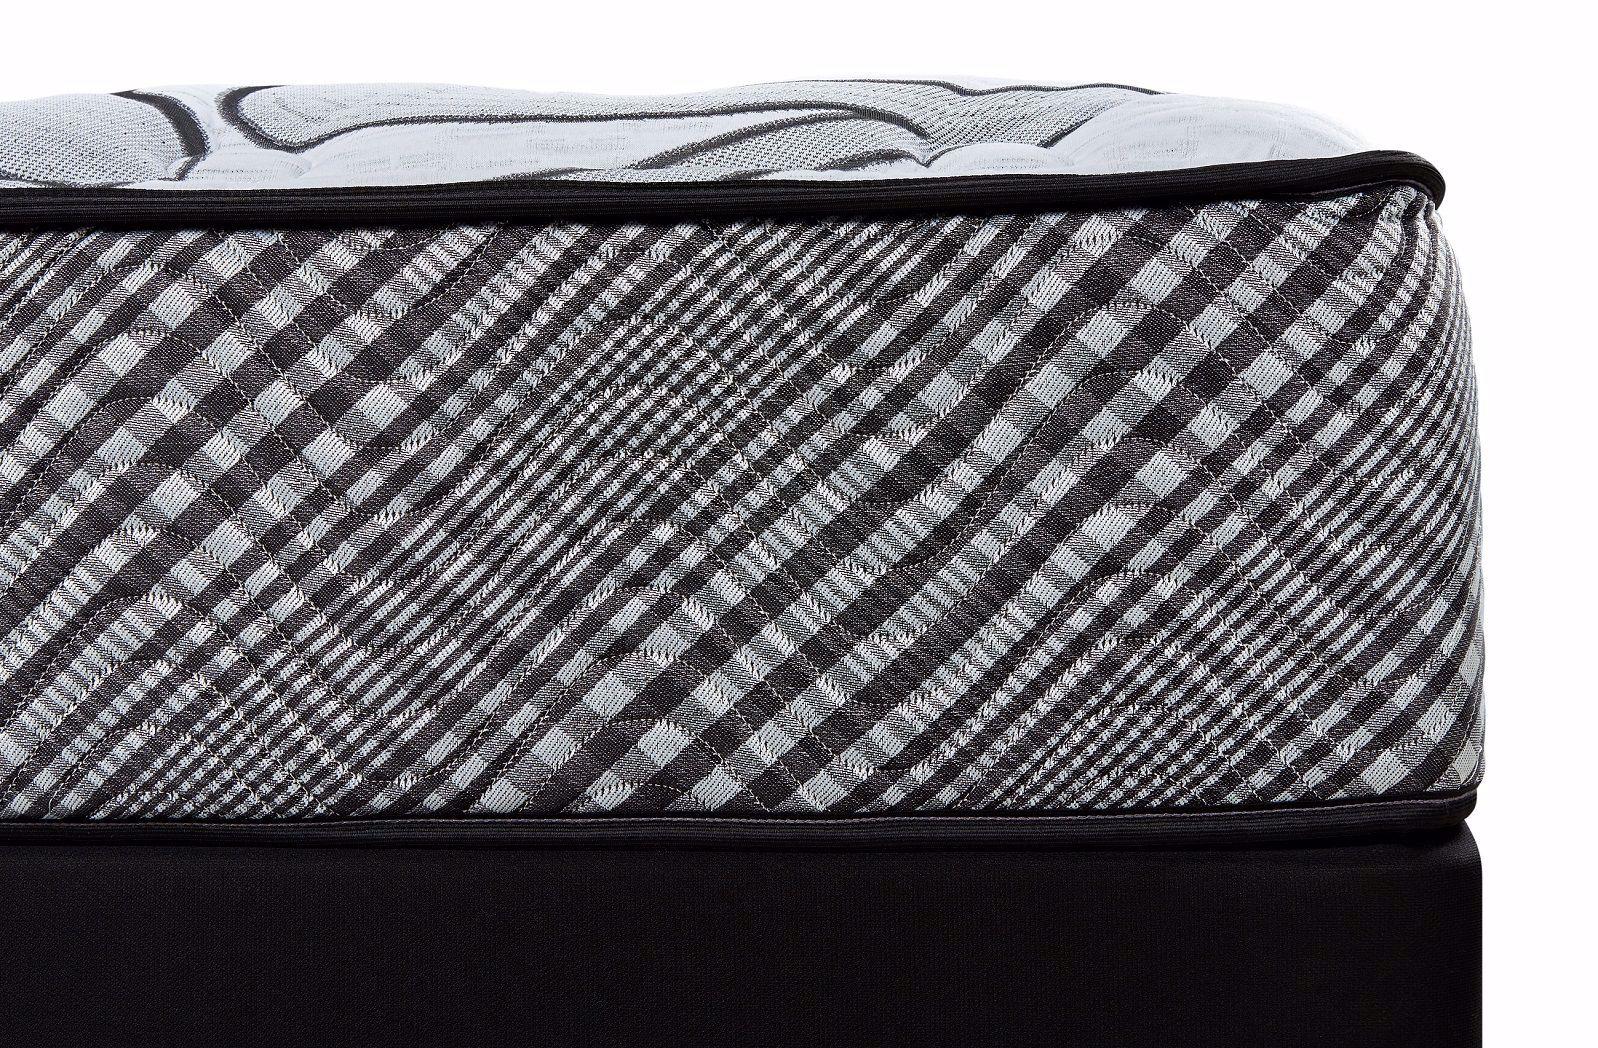 Picture of Restonic Darlington Plush Twin Mattress